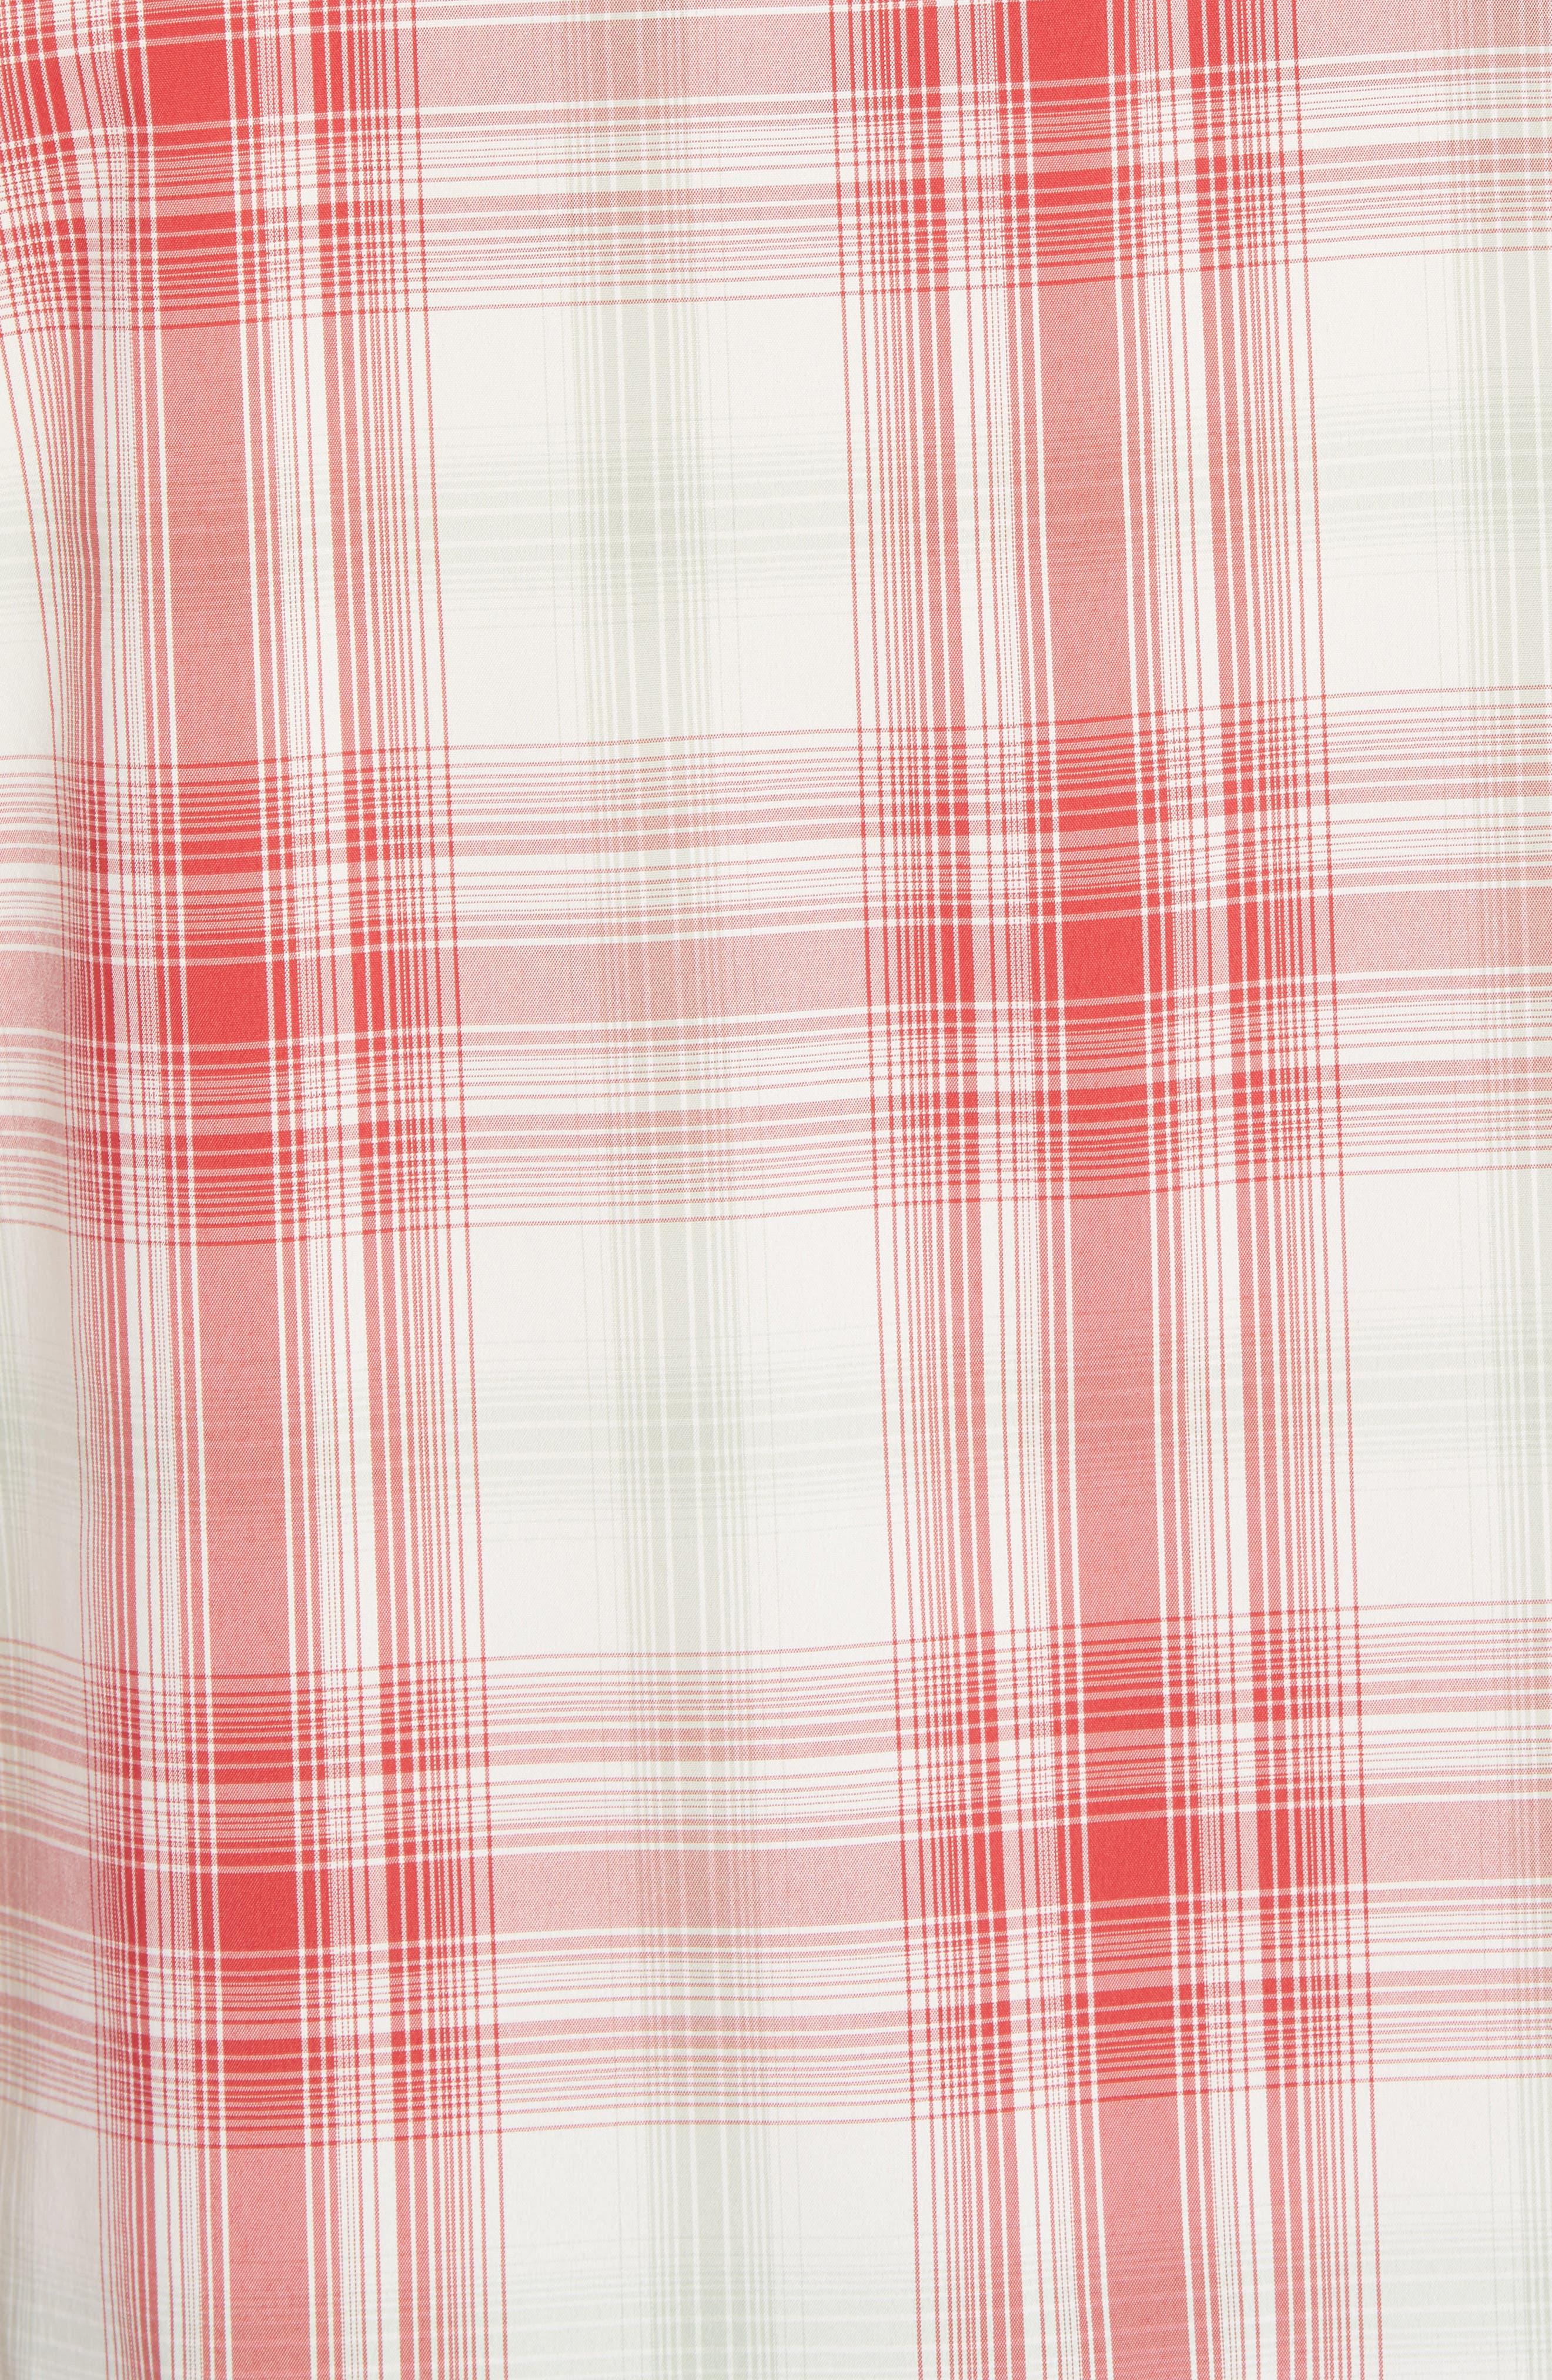 Regular Fit Plaid Sport Shirt,                             Alternate thumbnail 5, color,                             King Swing/ Static Red